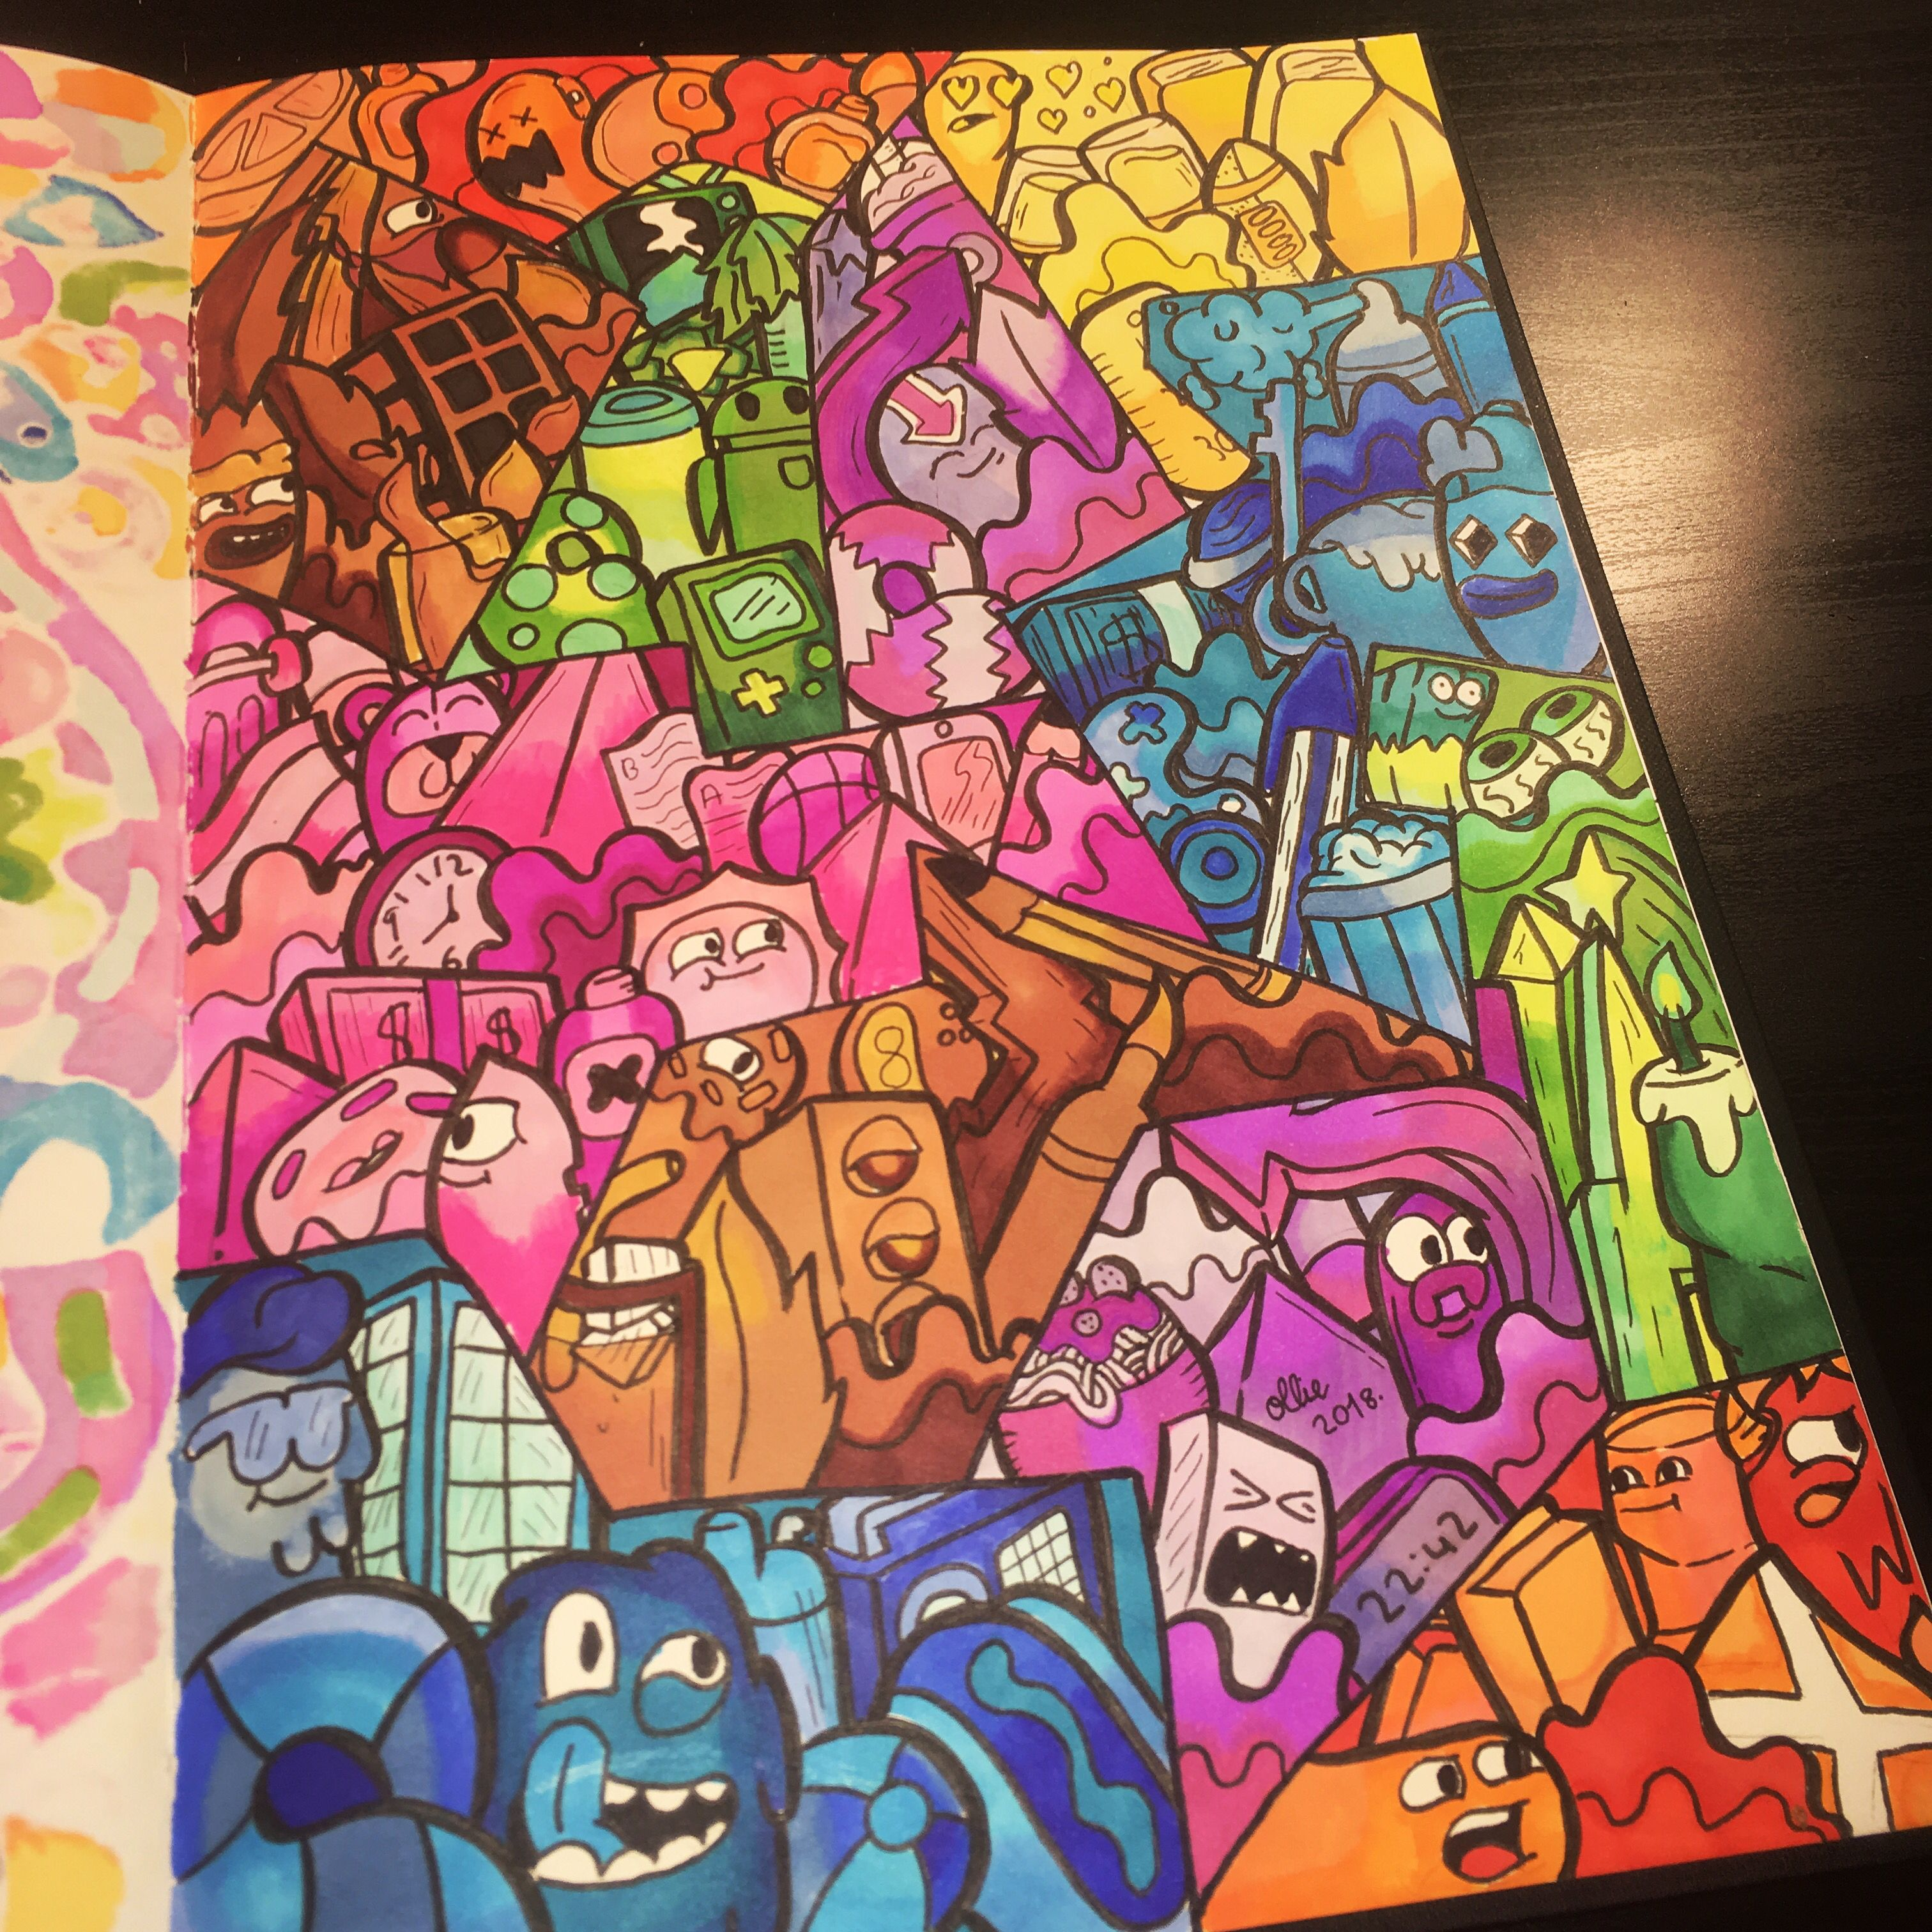 Vexx Art Doodleart Artwork Copic Illustration